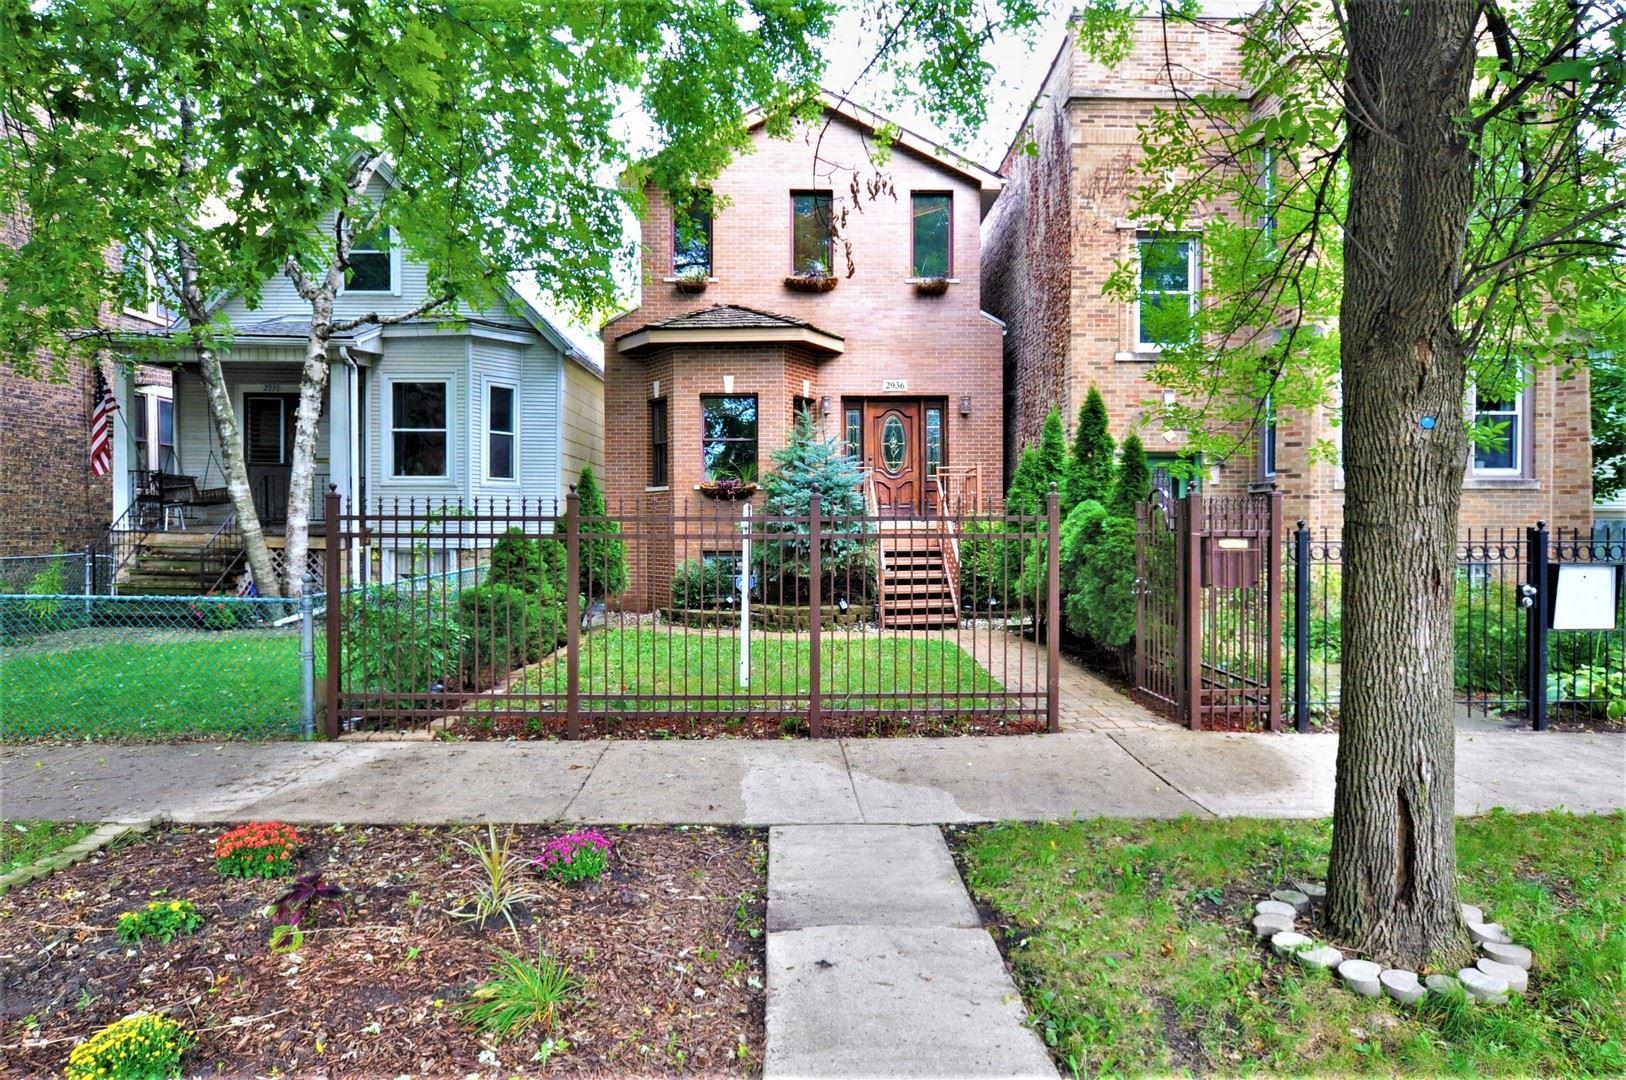 2936 W Belden Avenue, Chicago, IL 60647 - #: 10723789